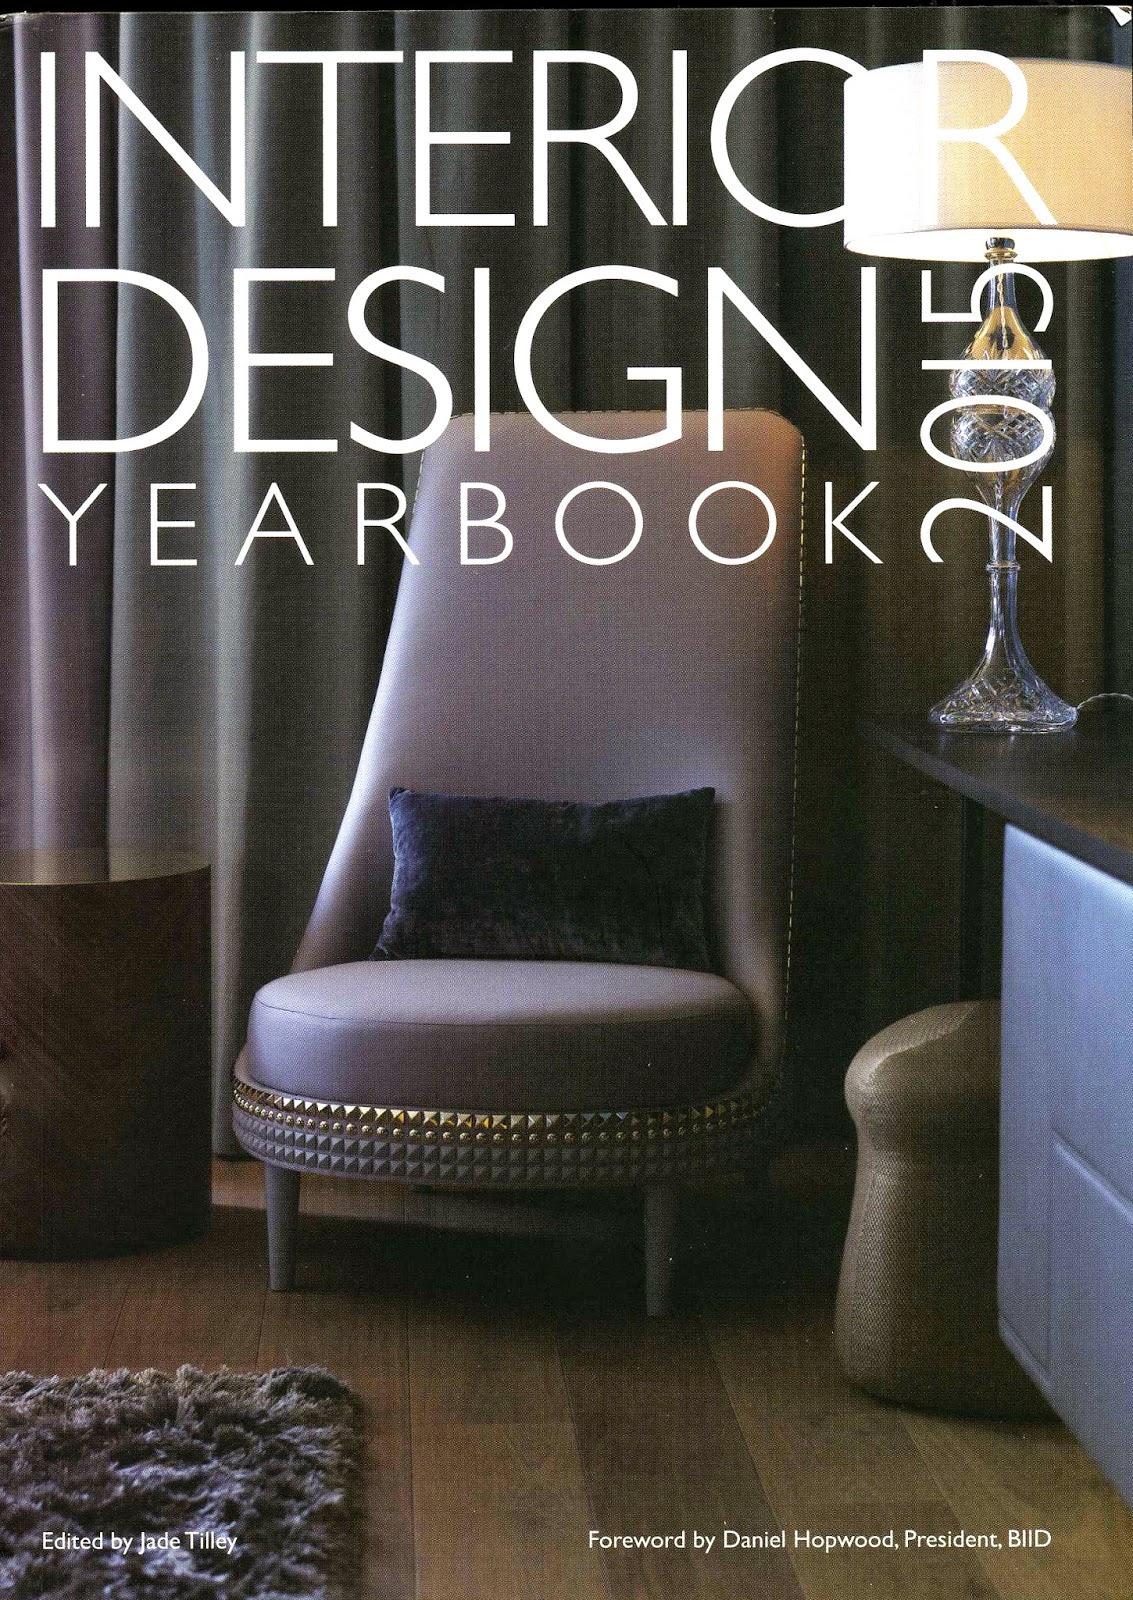 Alfies antique market press interior design yearbook 2015 for Interior design yearbook